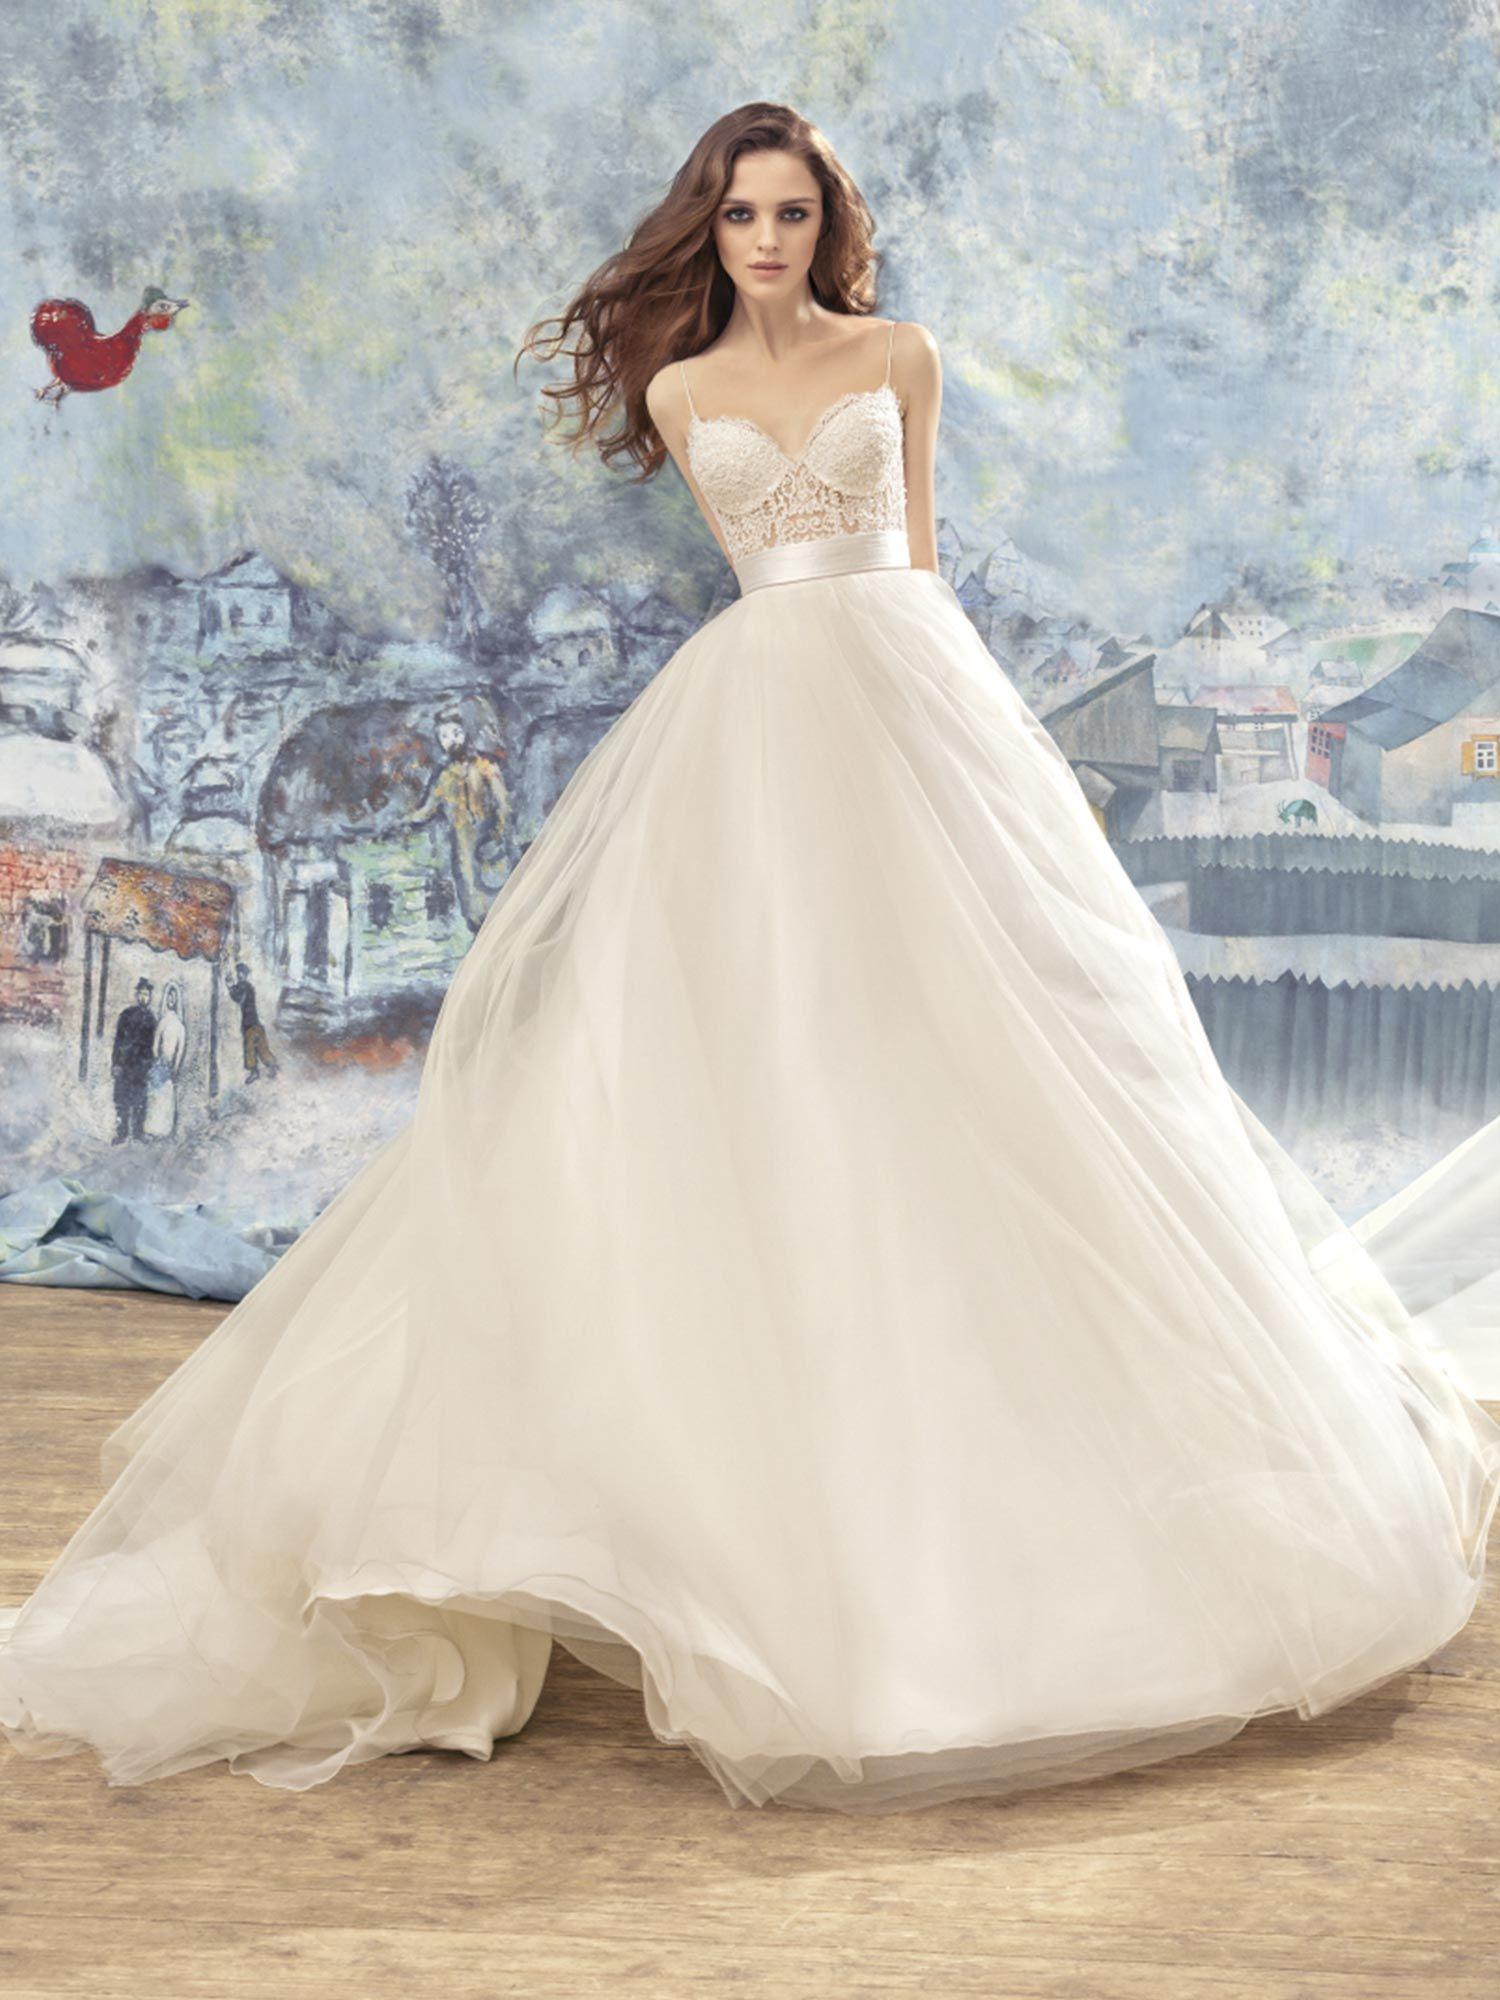 Lace Bustier Bodice Ball Gown Wedding Dress Fantasy Wedding